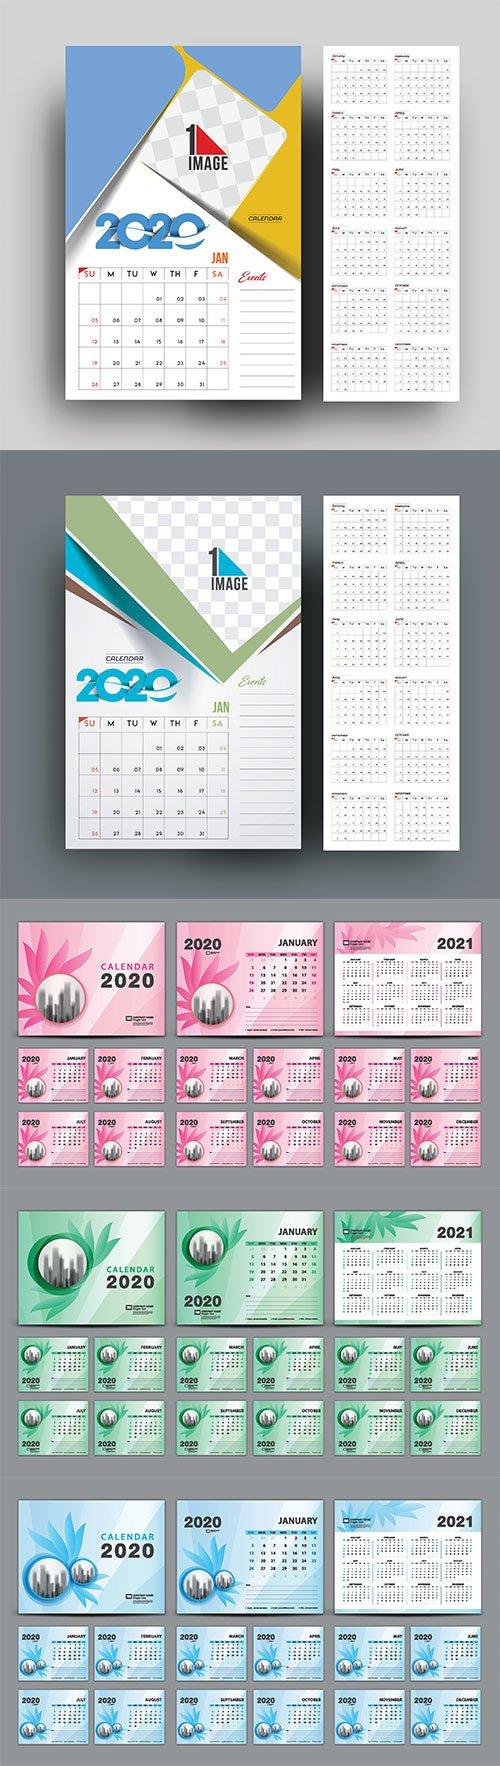 Desk Calendar 2020 template vector, cover design, Set of 12 Months